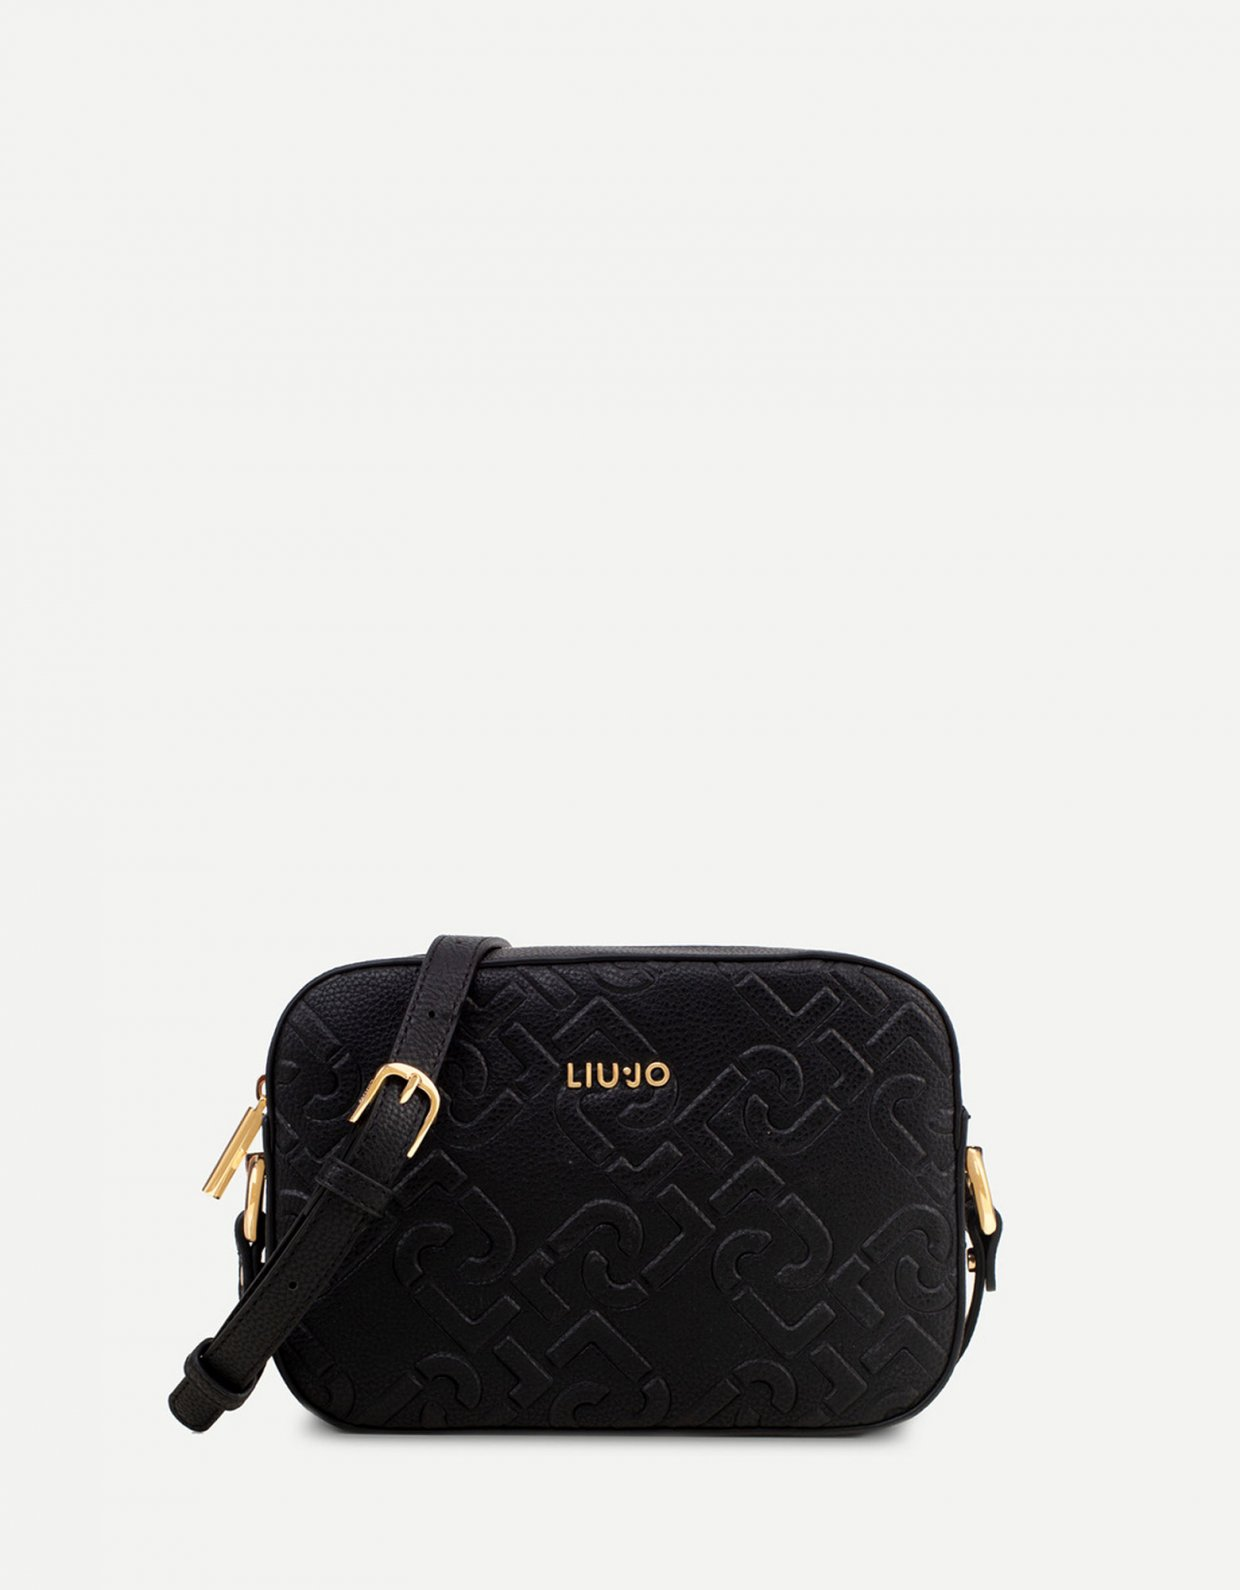 Liu Jo Crossbody bag with logo black